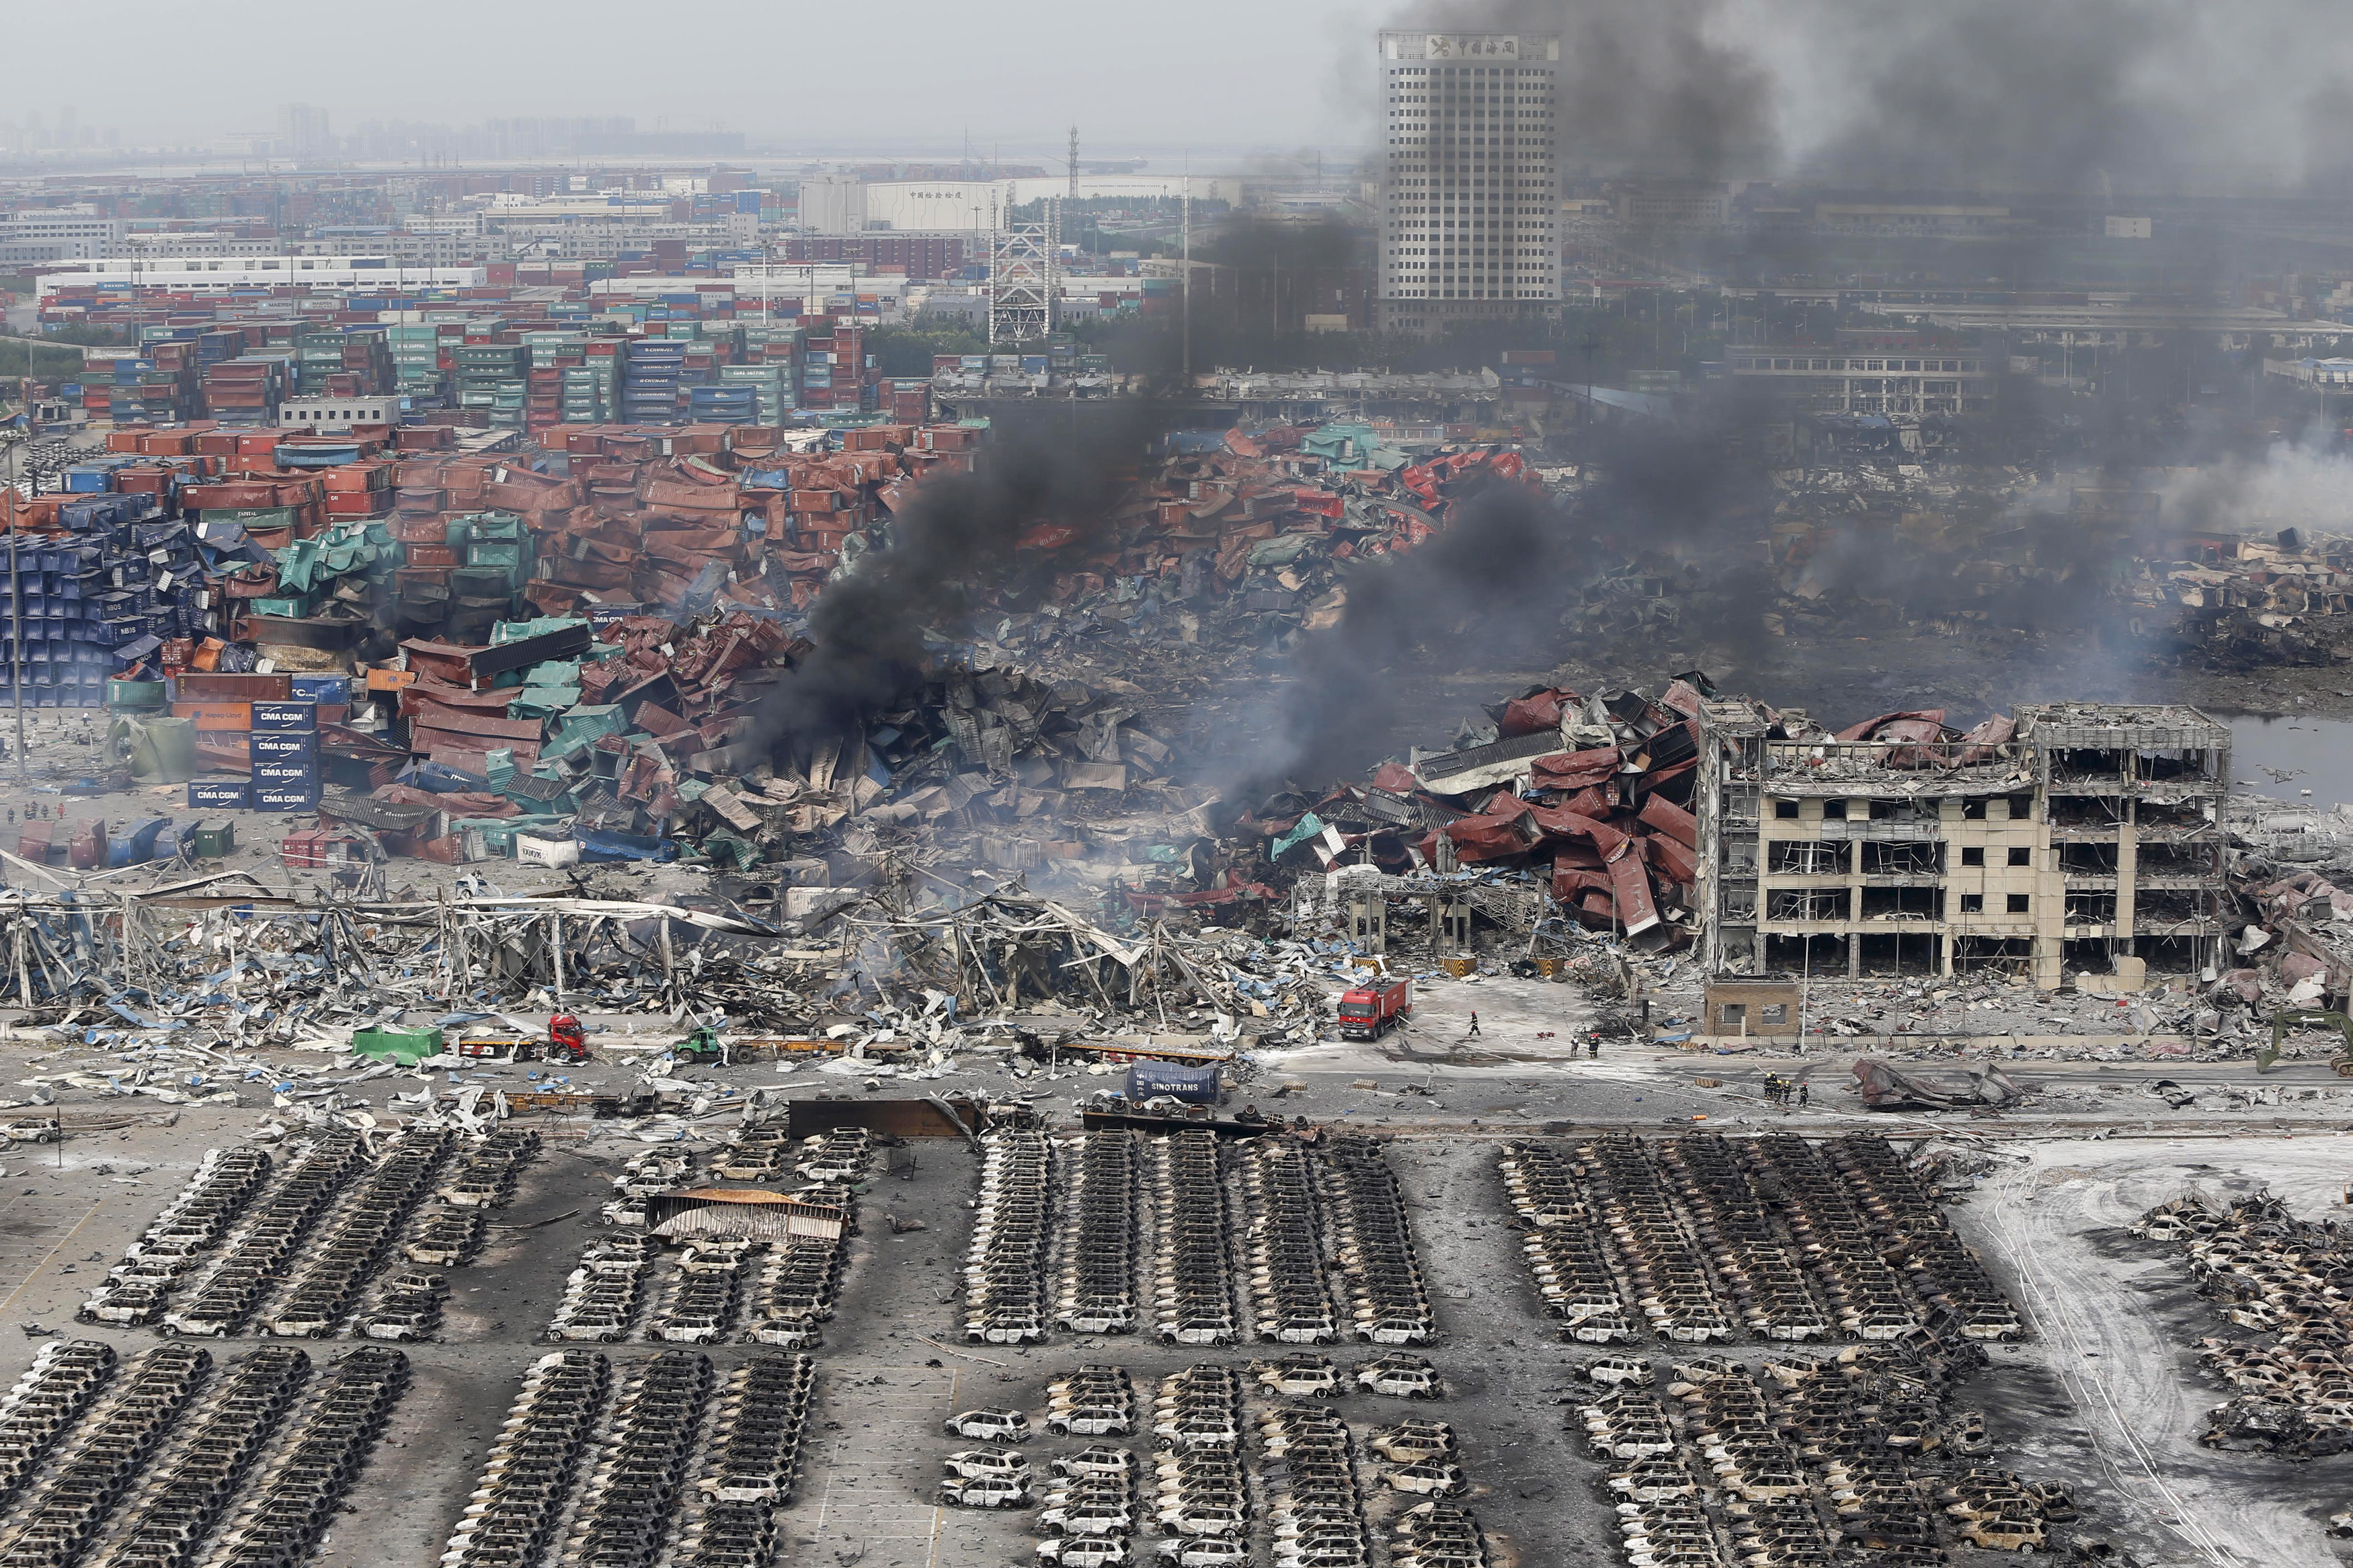 IN PHOTOS: Devastation of Tianjin